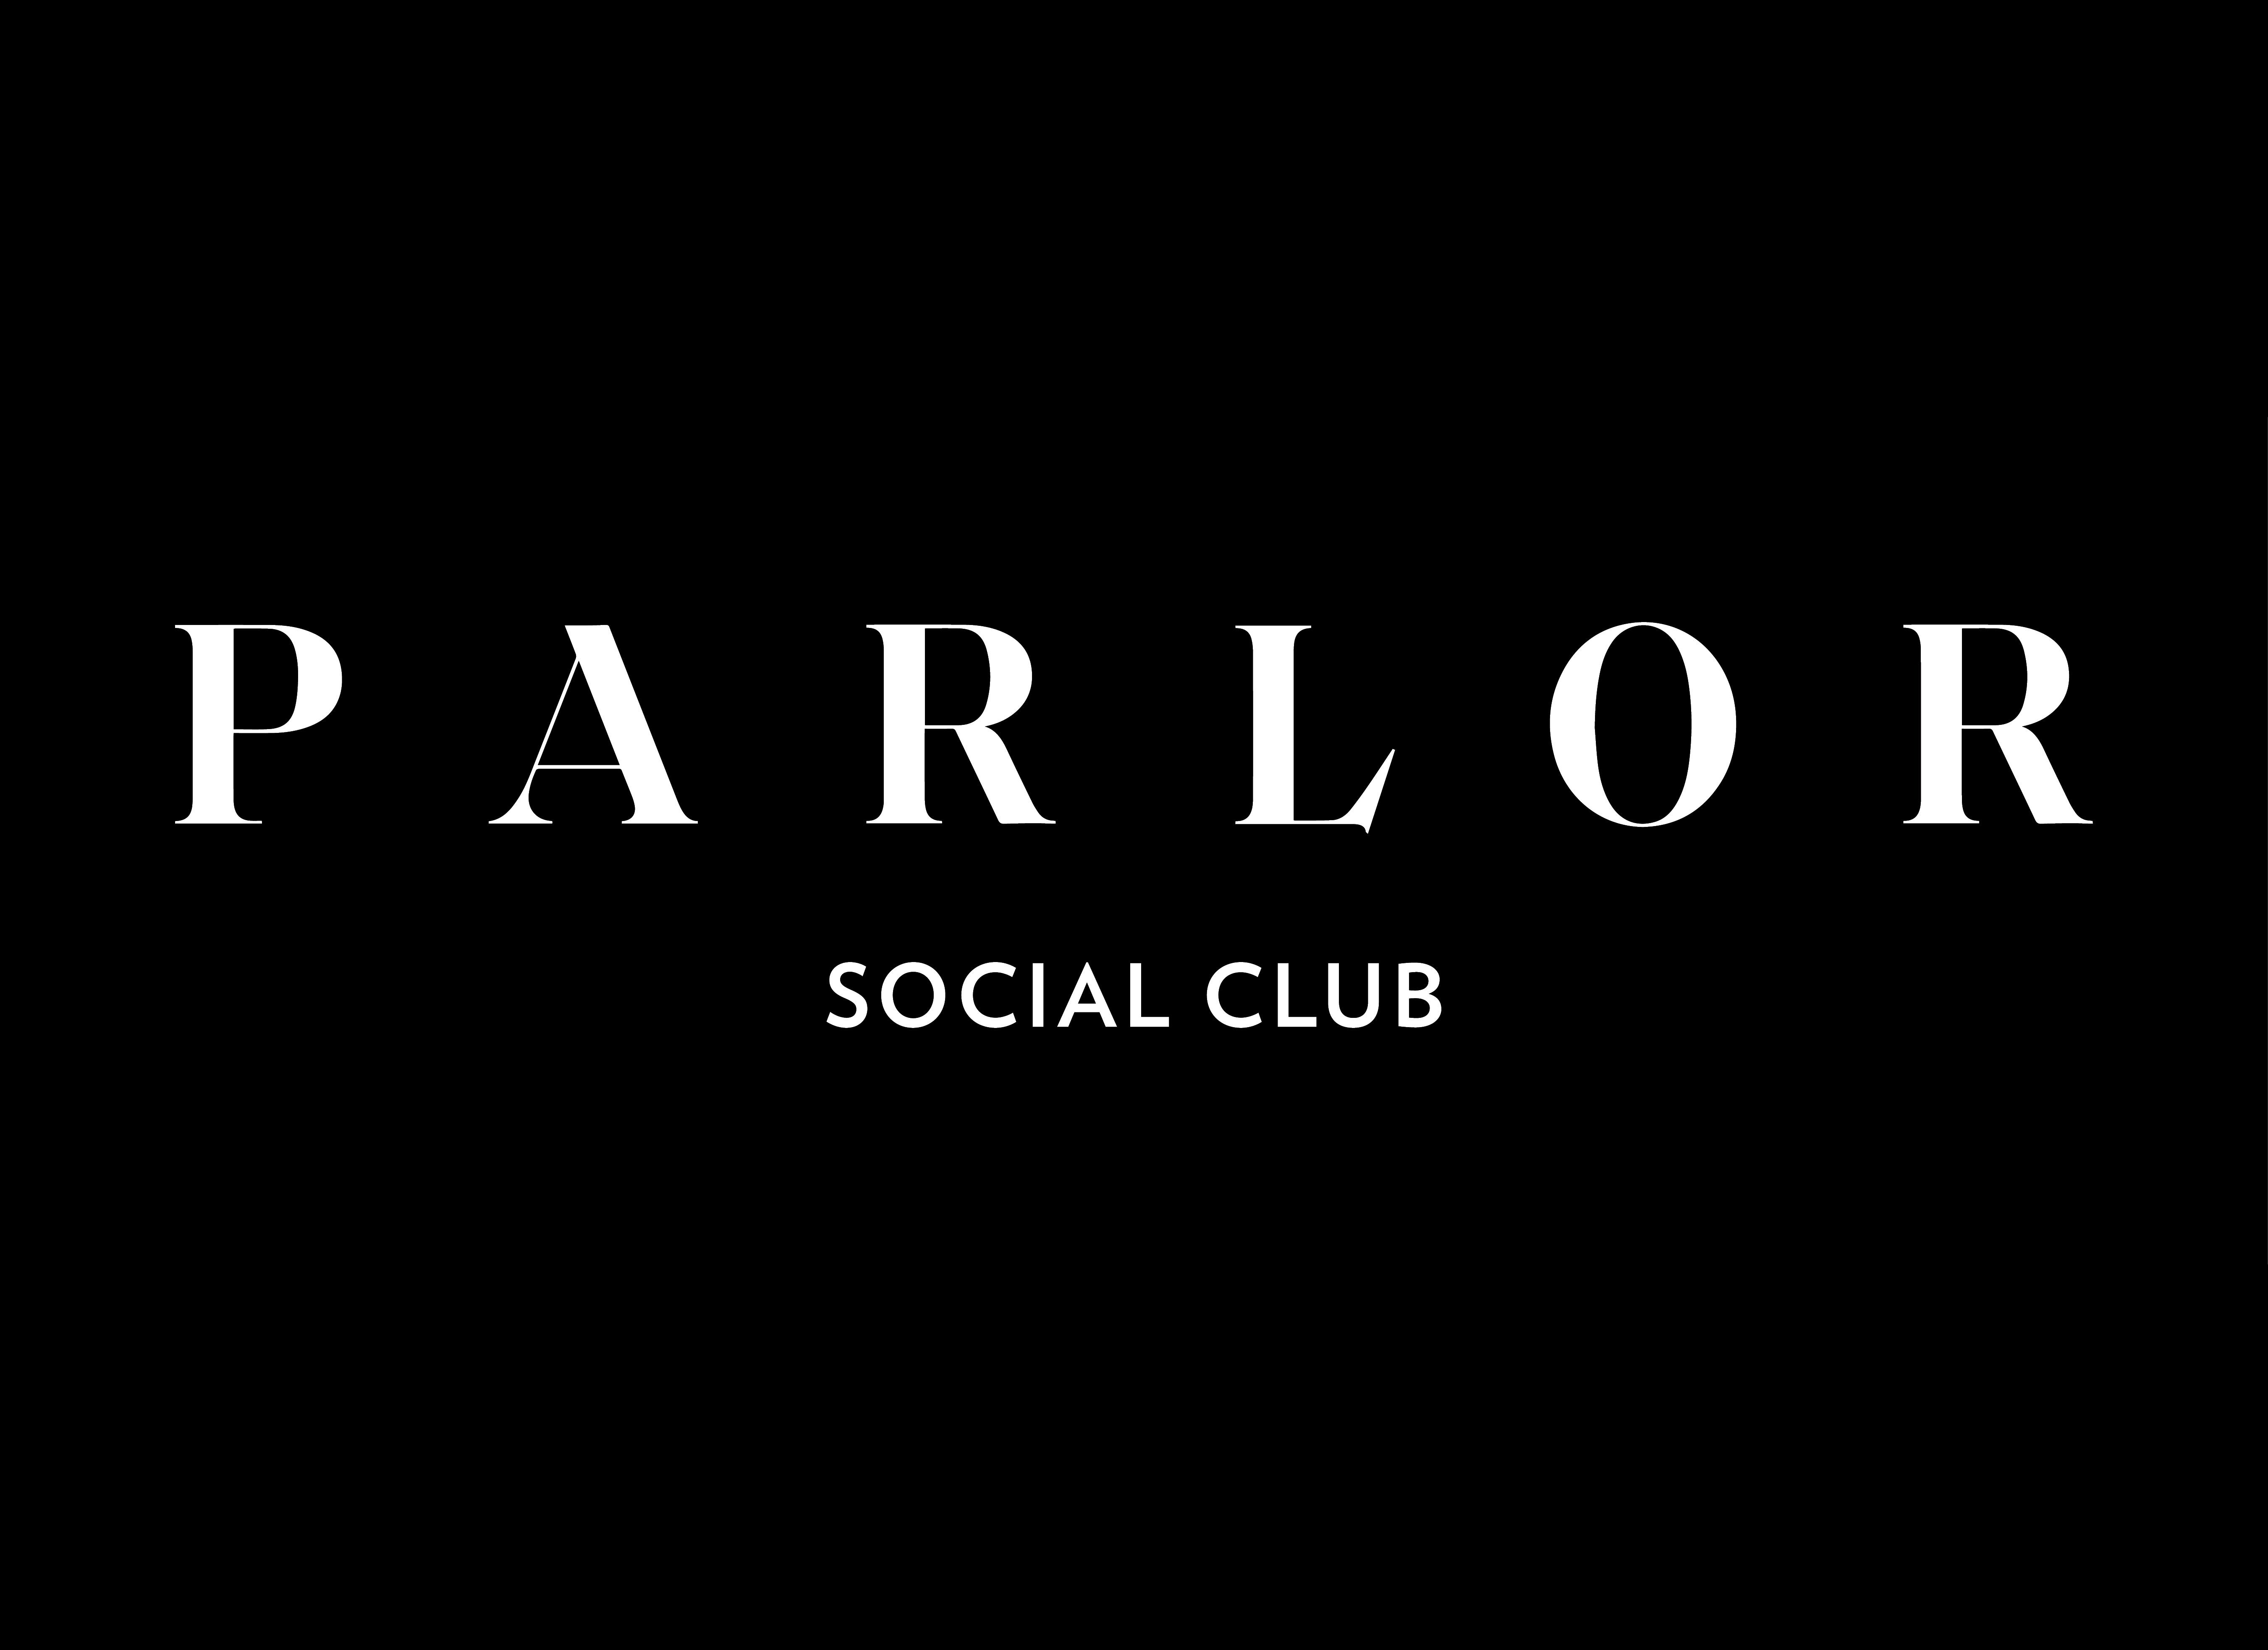 Parlor Social